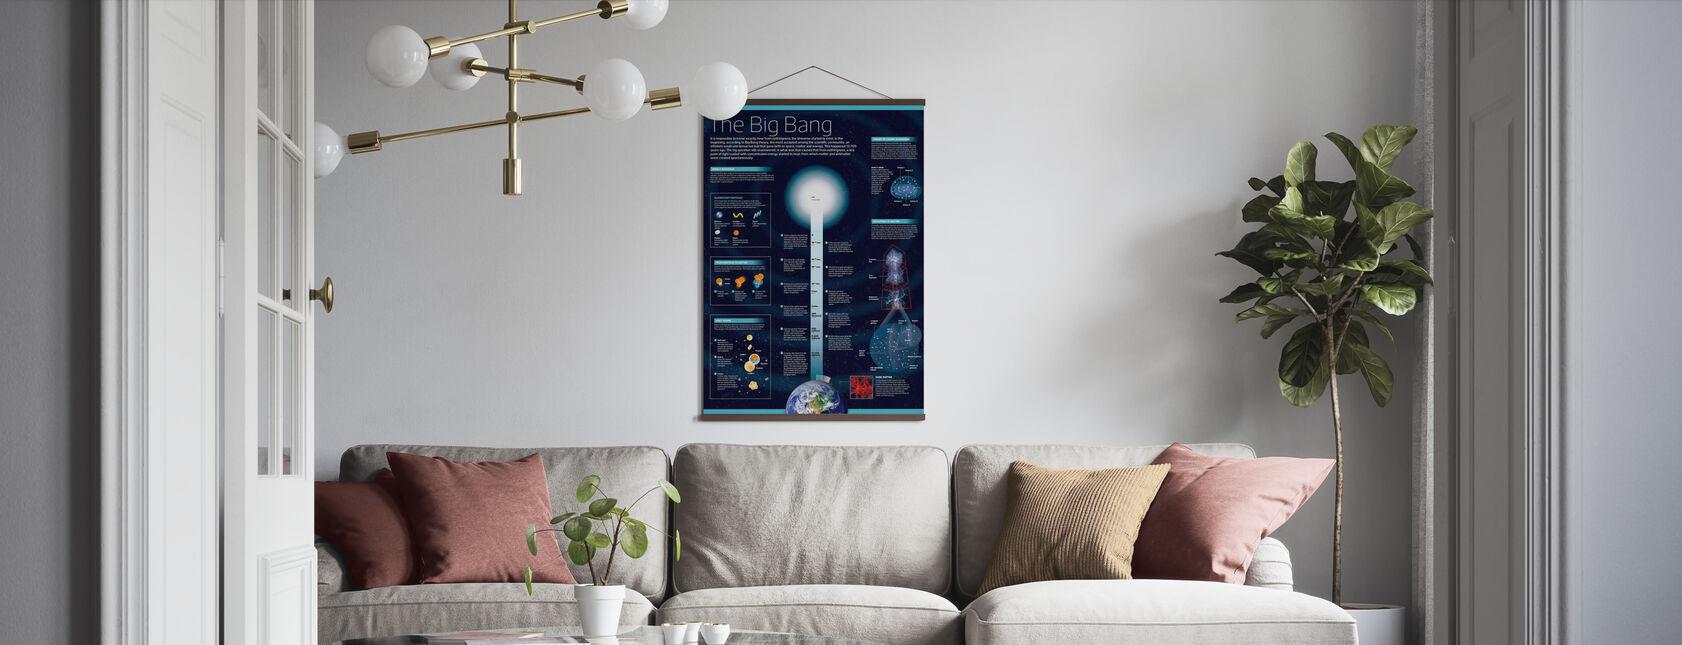 The Big Bang - Poster - Living Room